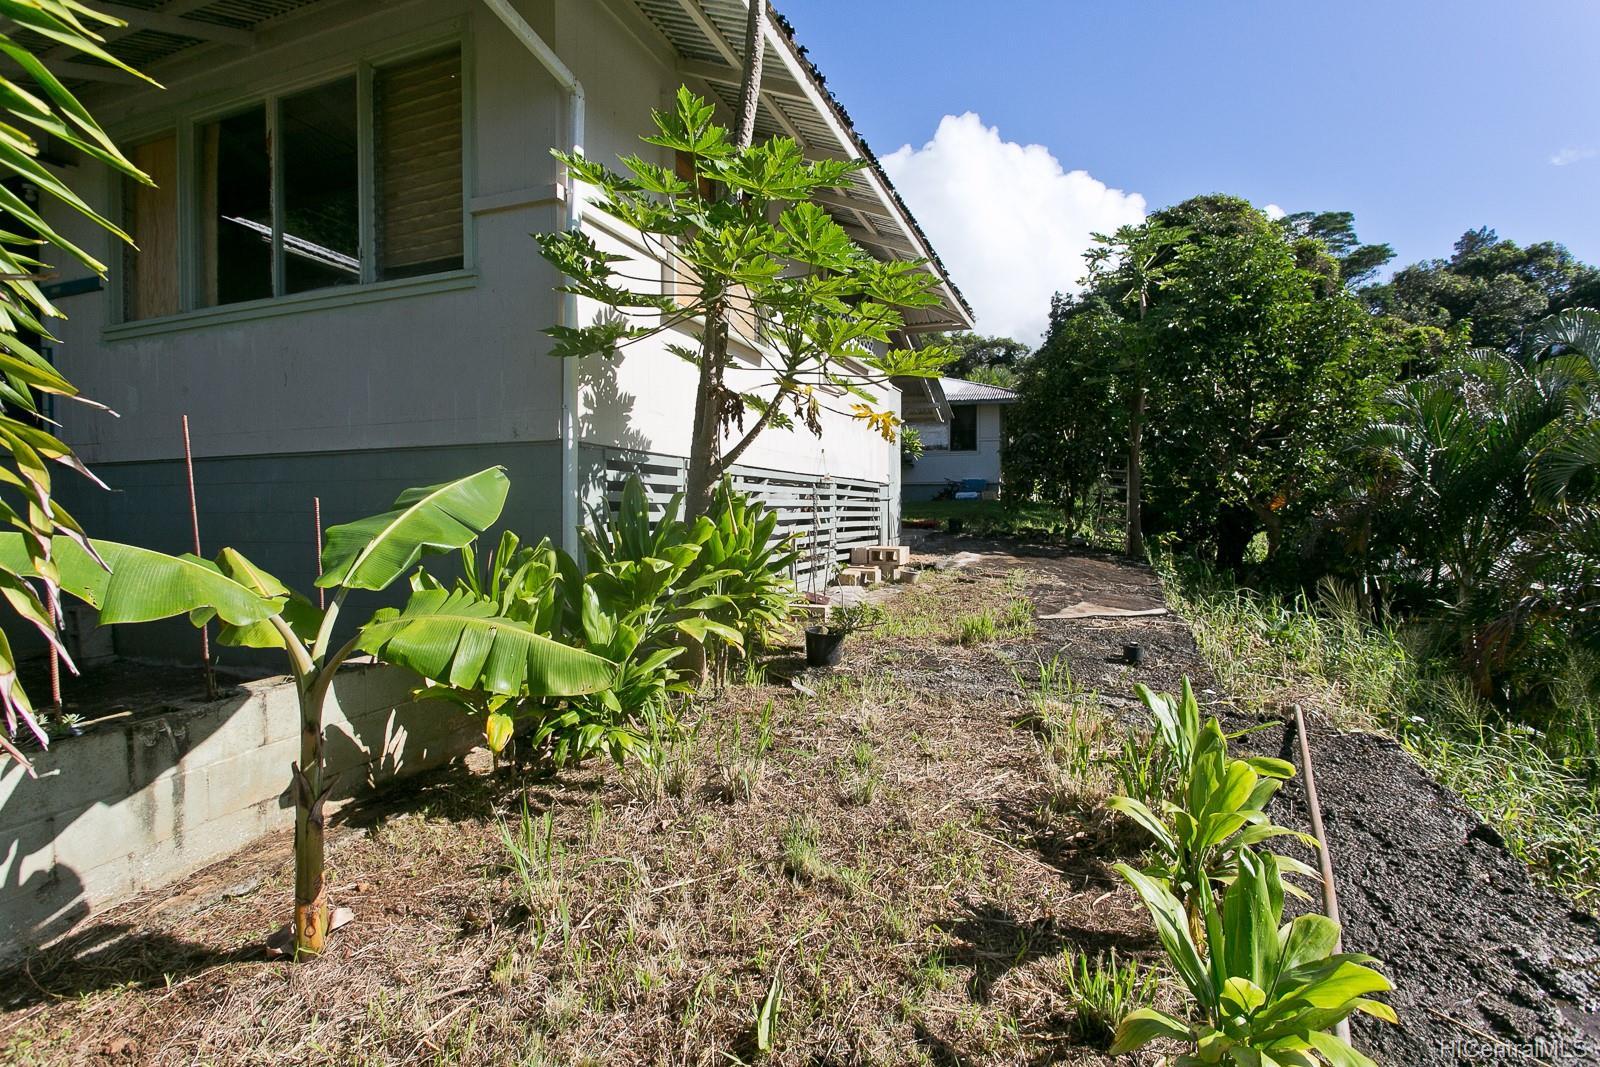 3434 Kalihi Street Honolulu - Multi-family - photo 12 of 20